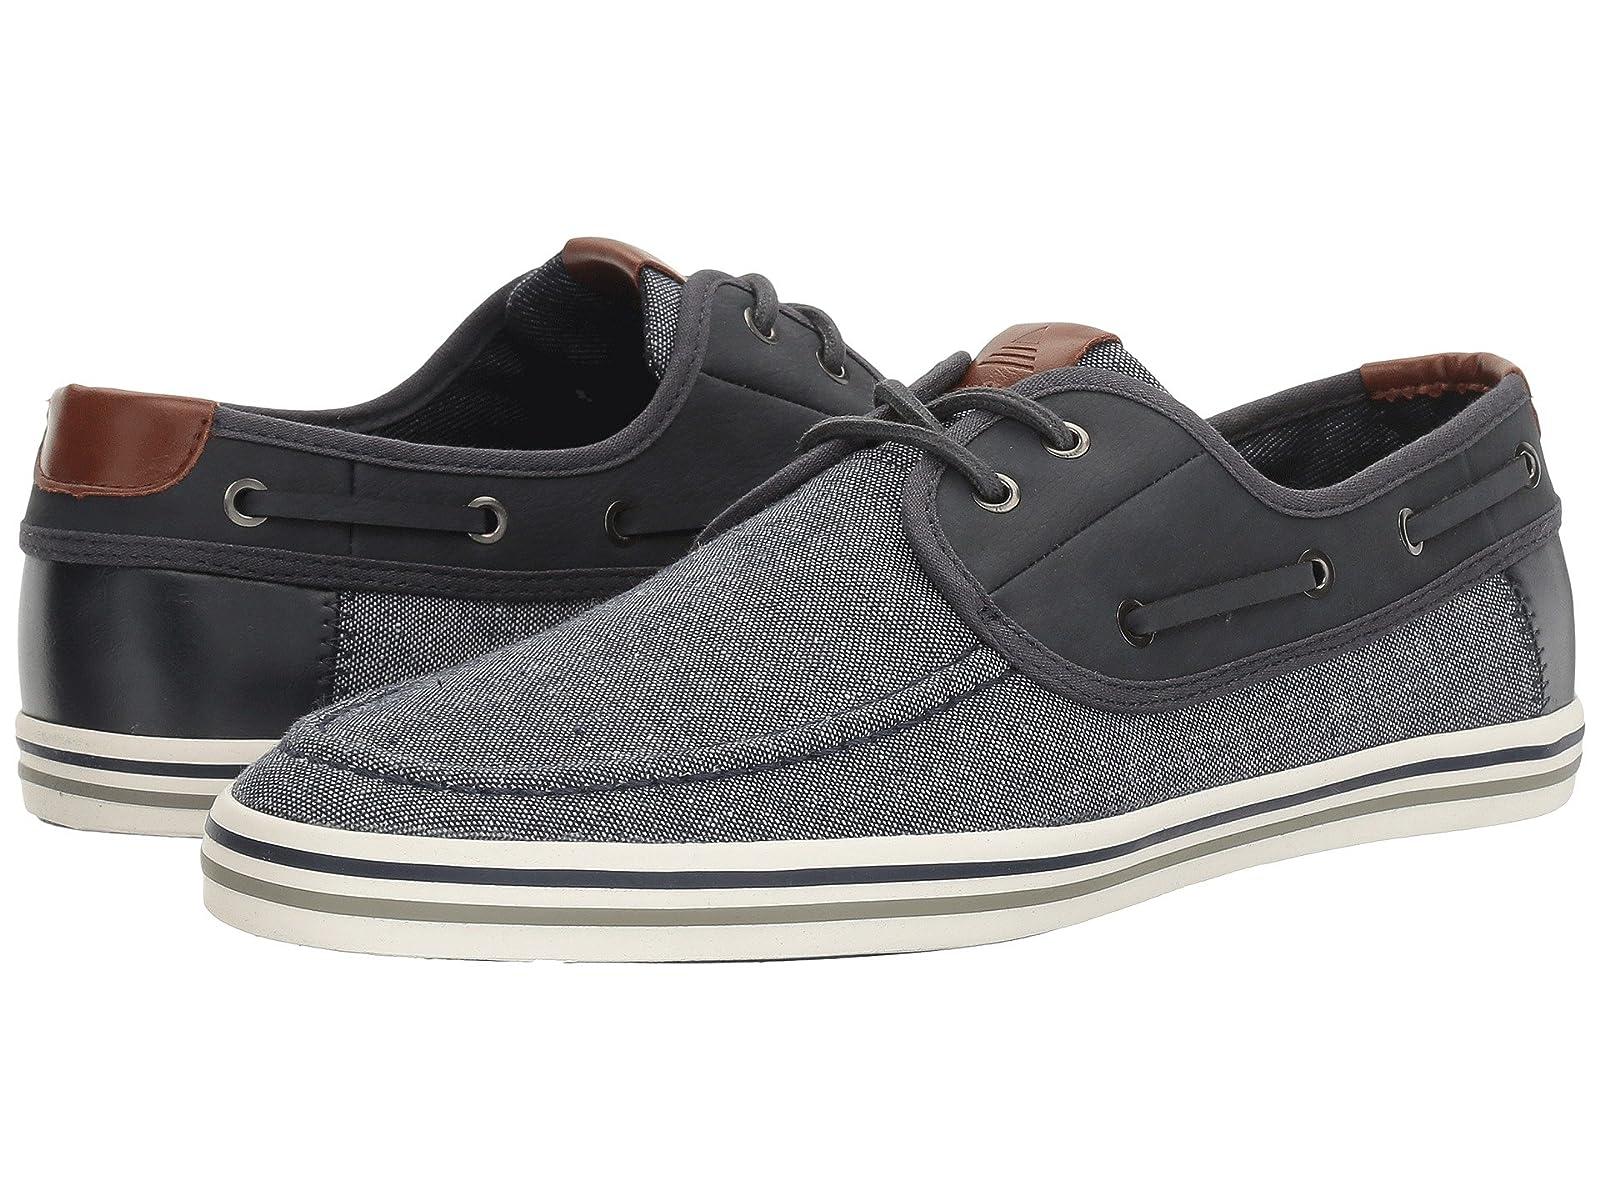 ALDO SherrittCheap and distinctive eye-catching shoes